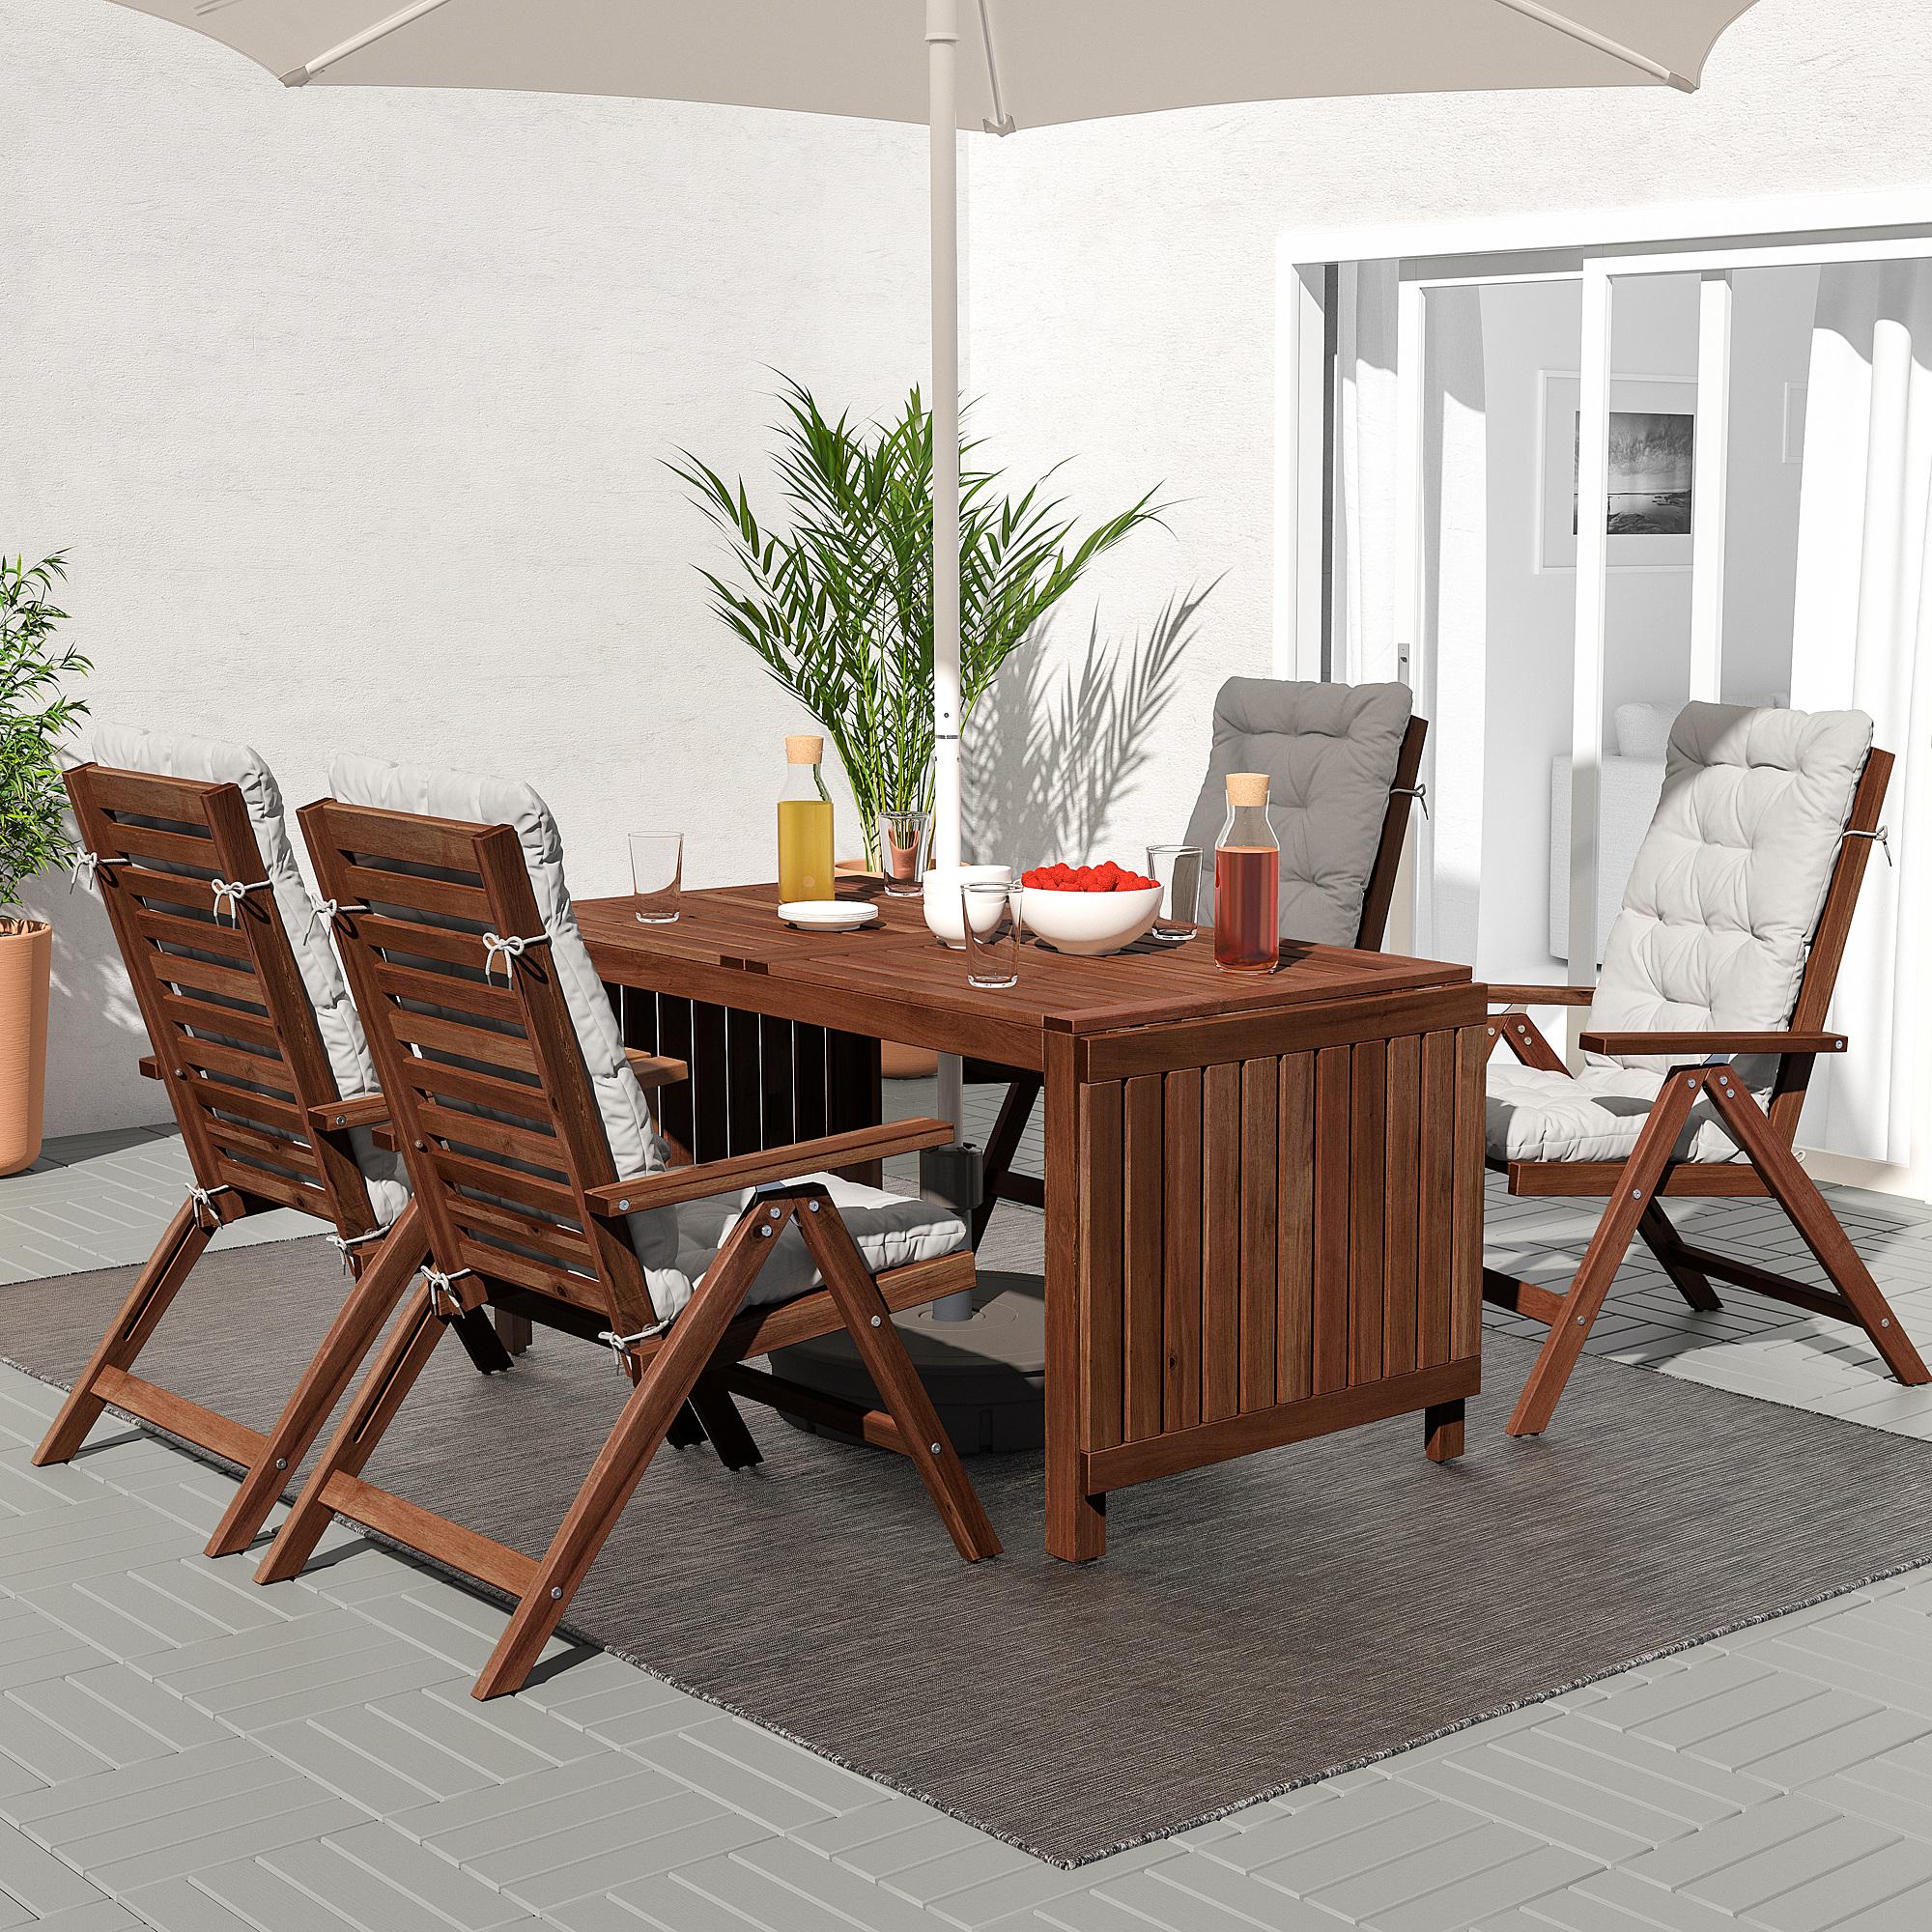 ÄPPLARÖ drop-leaf table, outdoor